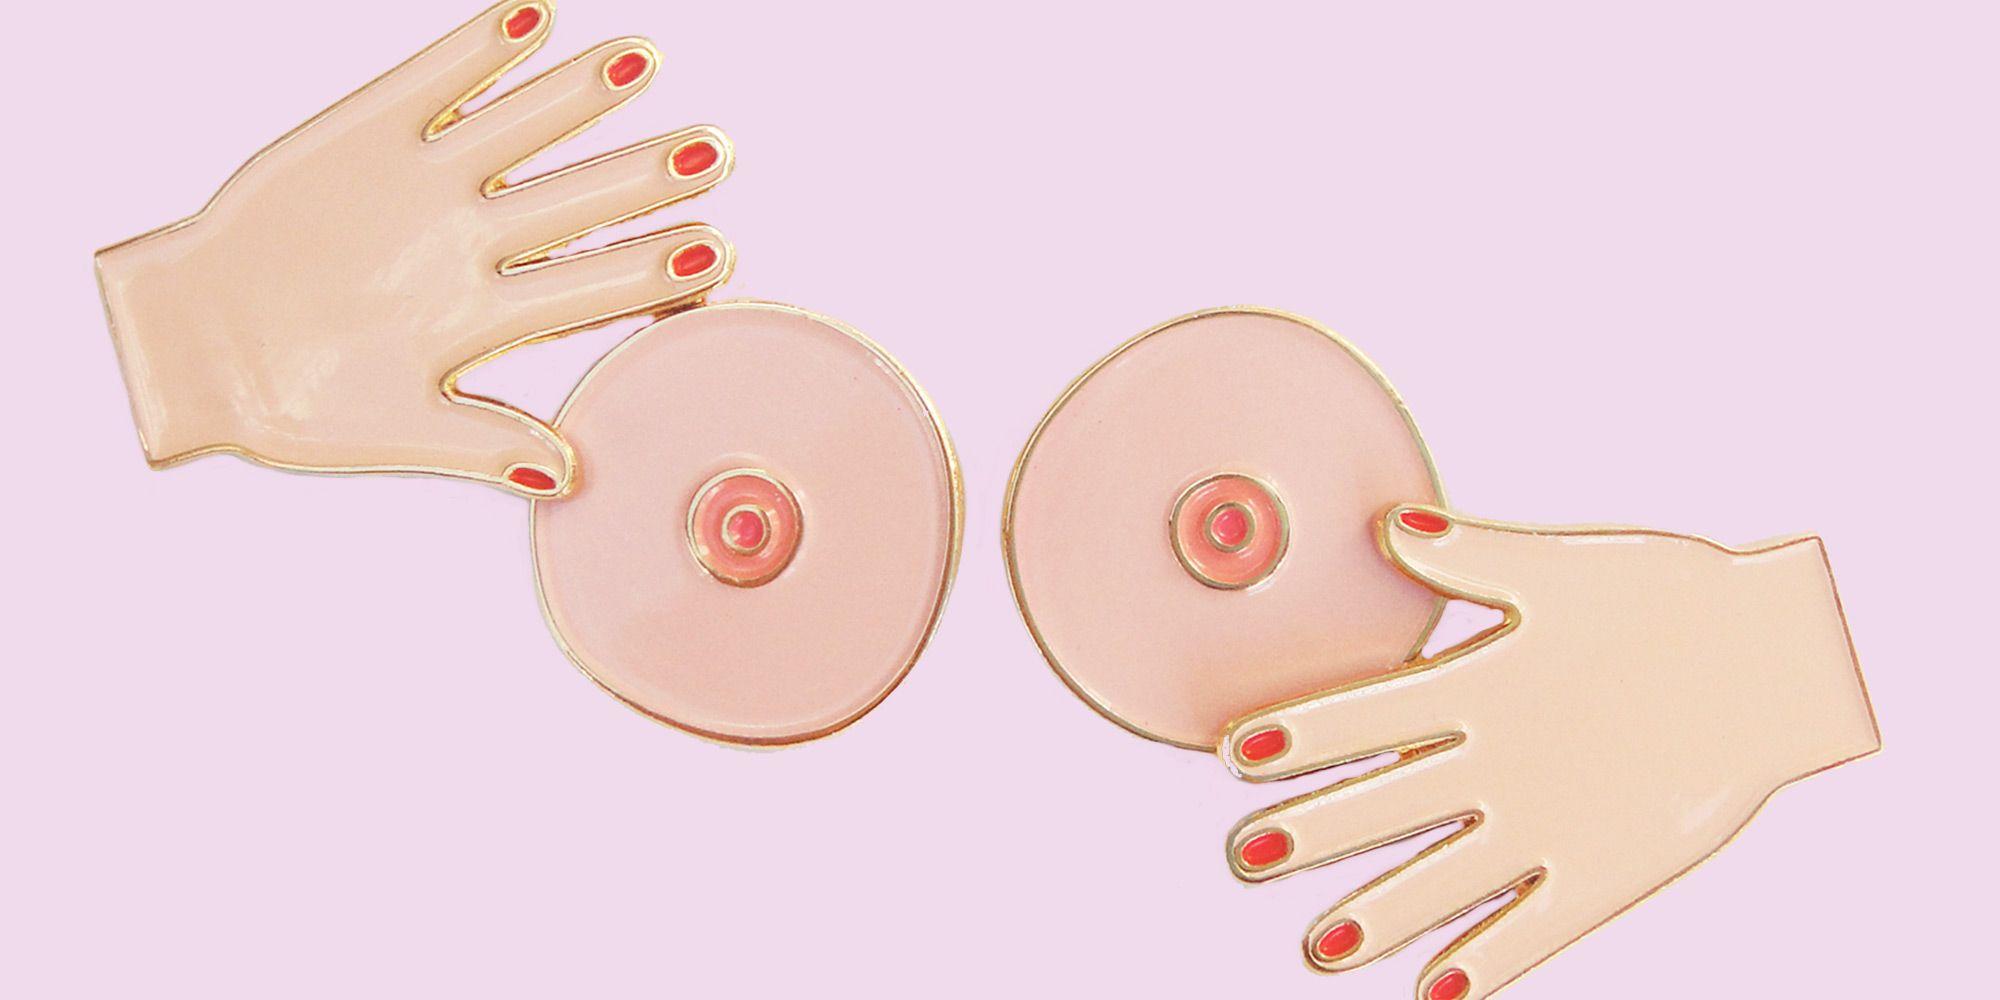 Girls showing her vagina